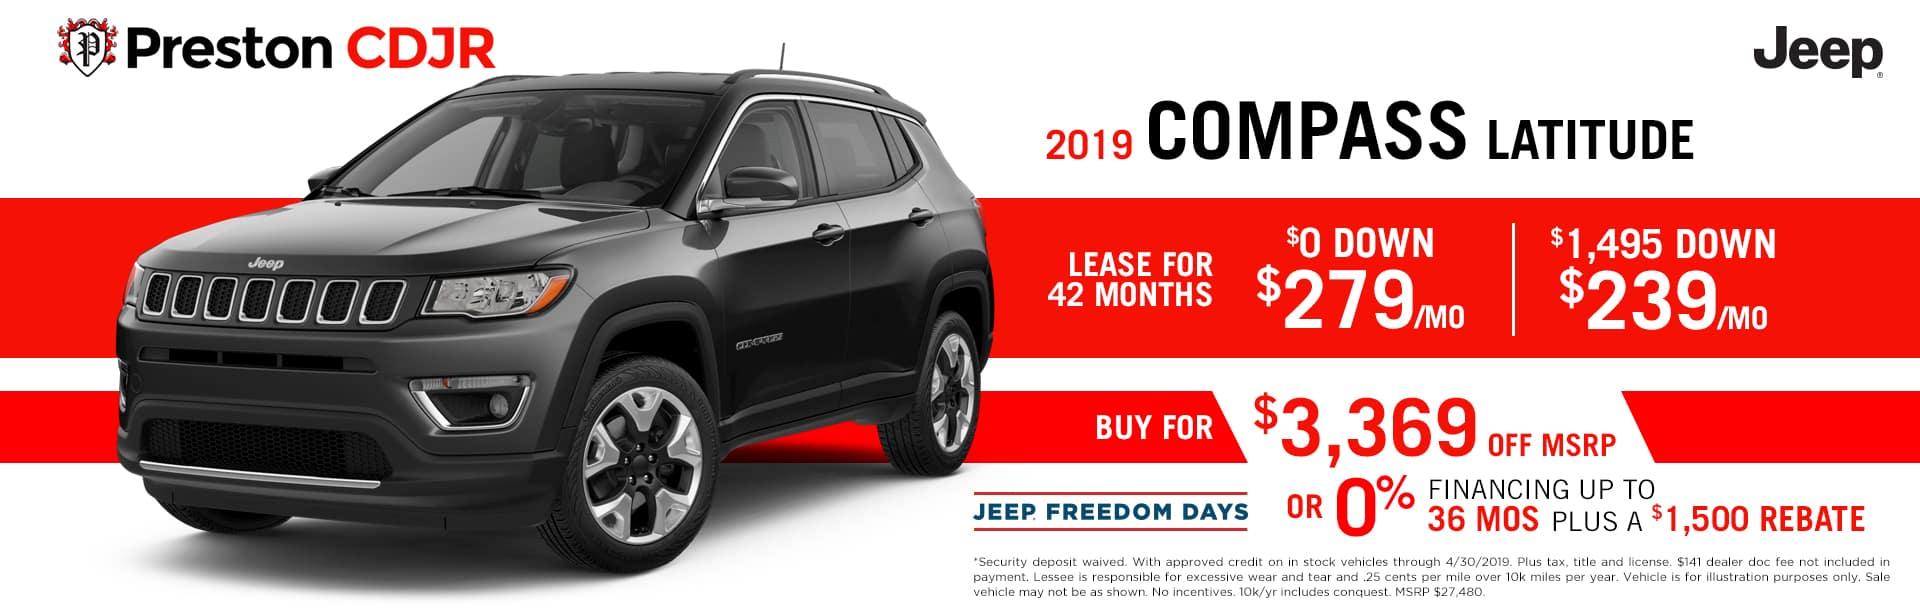 deal jeep compass latitude